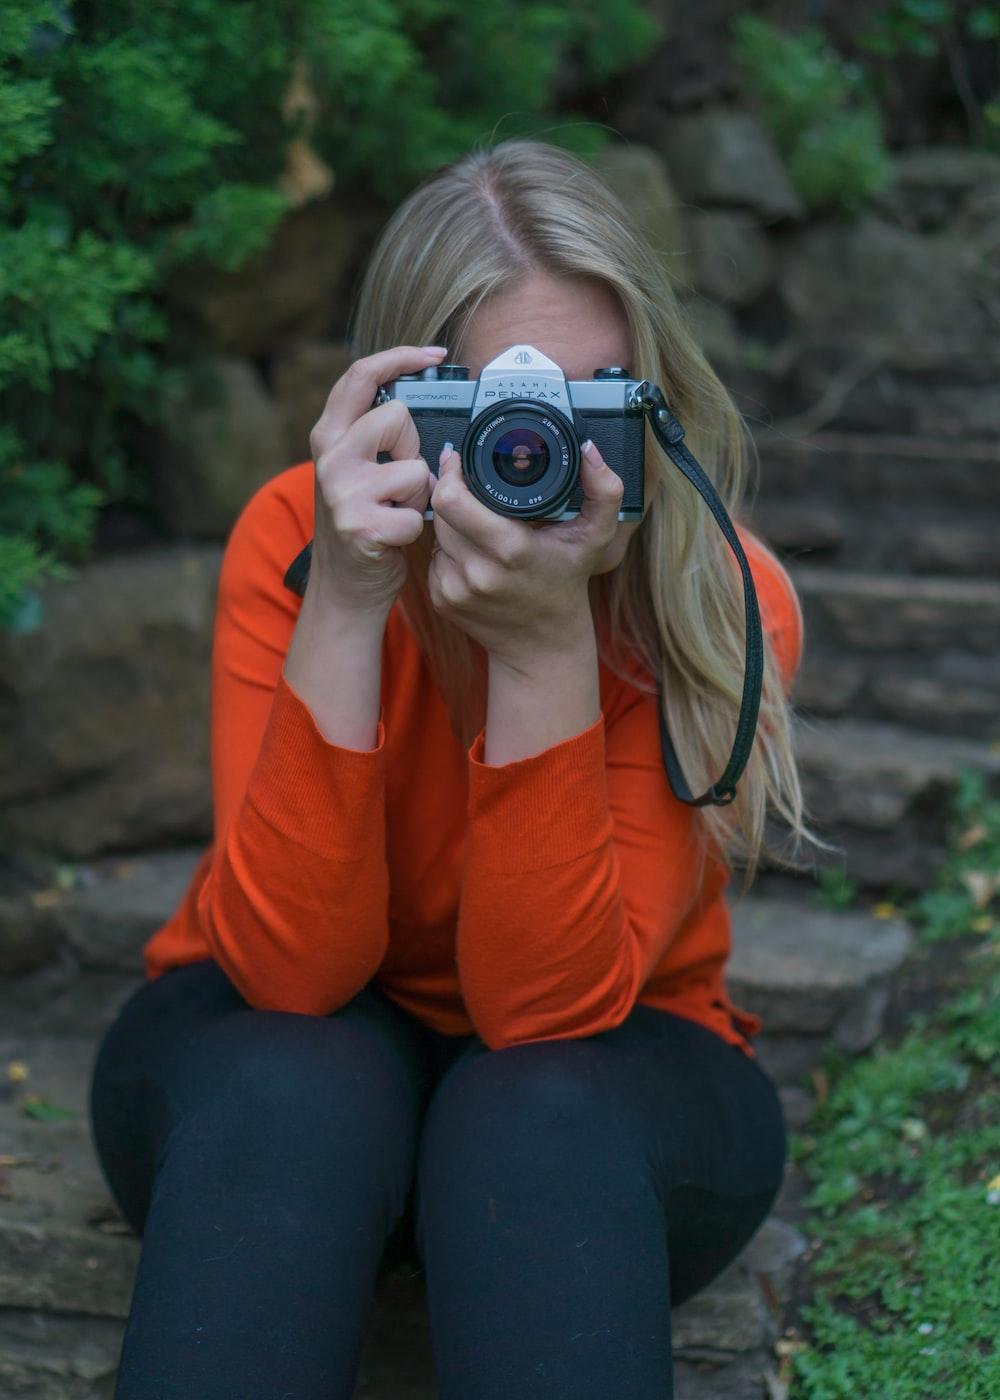 woman in orange long sleeve shirt and black pants holding black camera